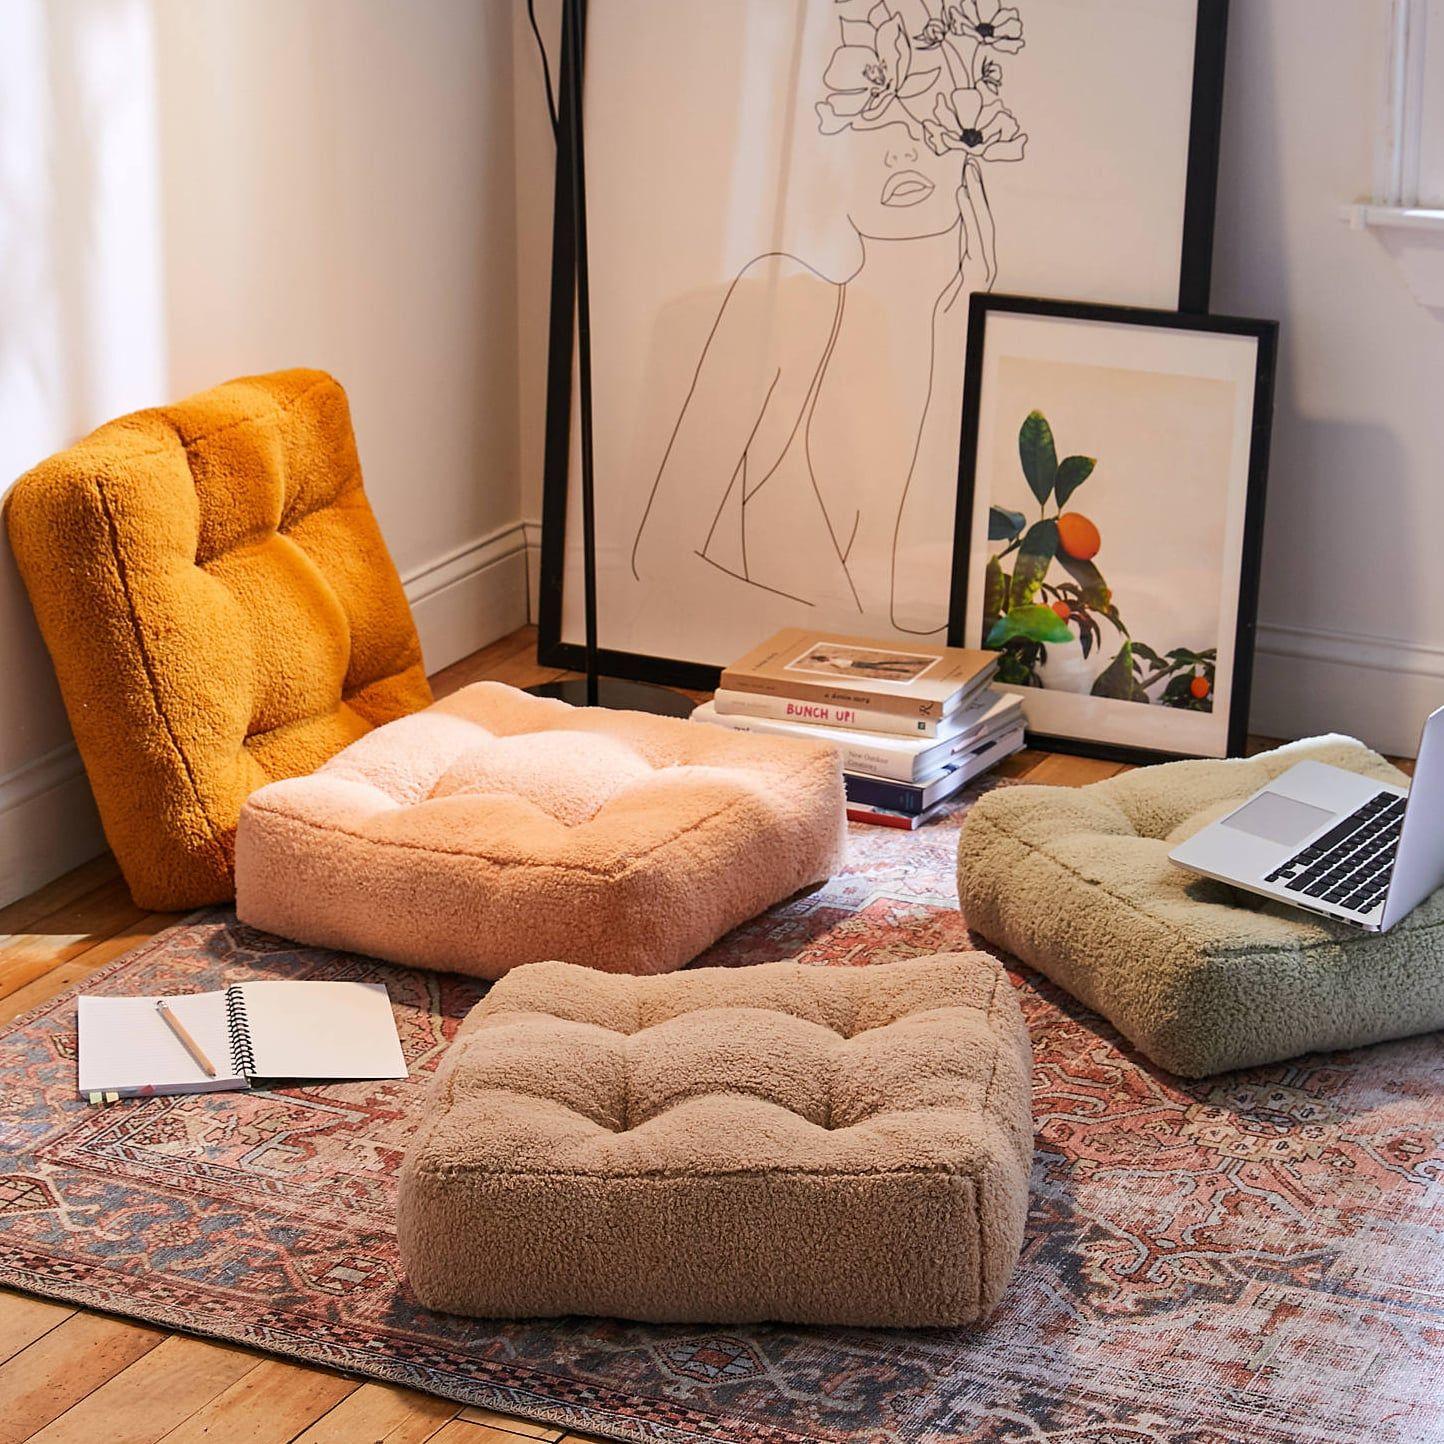 Here S How I Set Up A Meditation Corner In My Studio Apartment In 2020 Meditation Corner Meditation Room Decor Studio Apartment Decorating